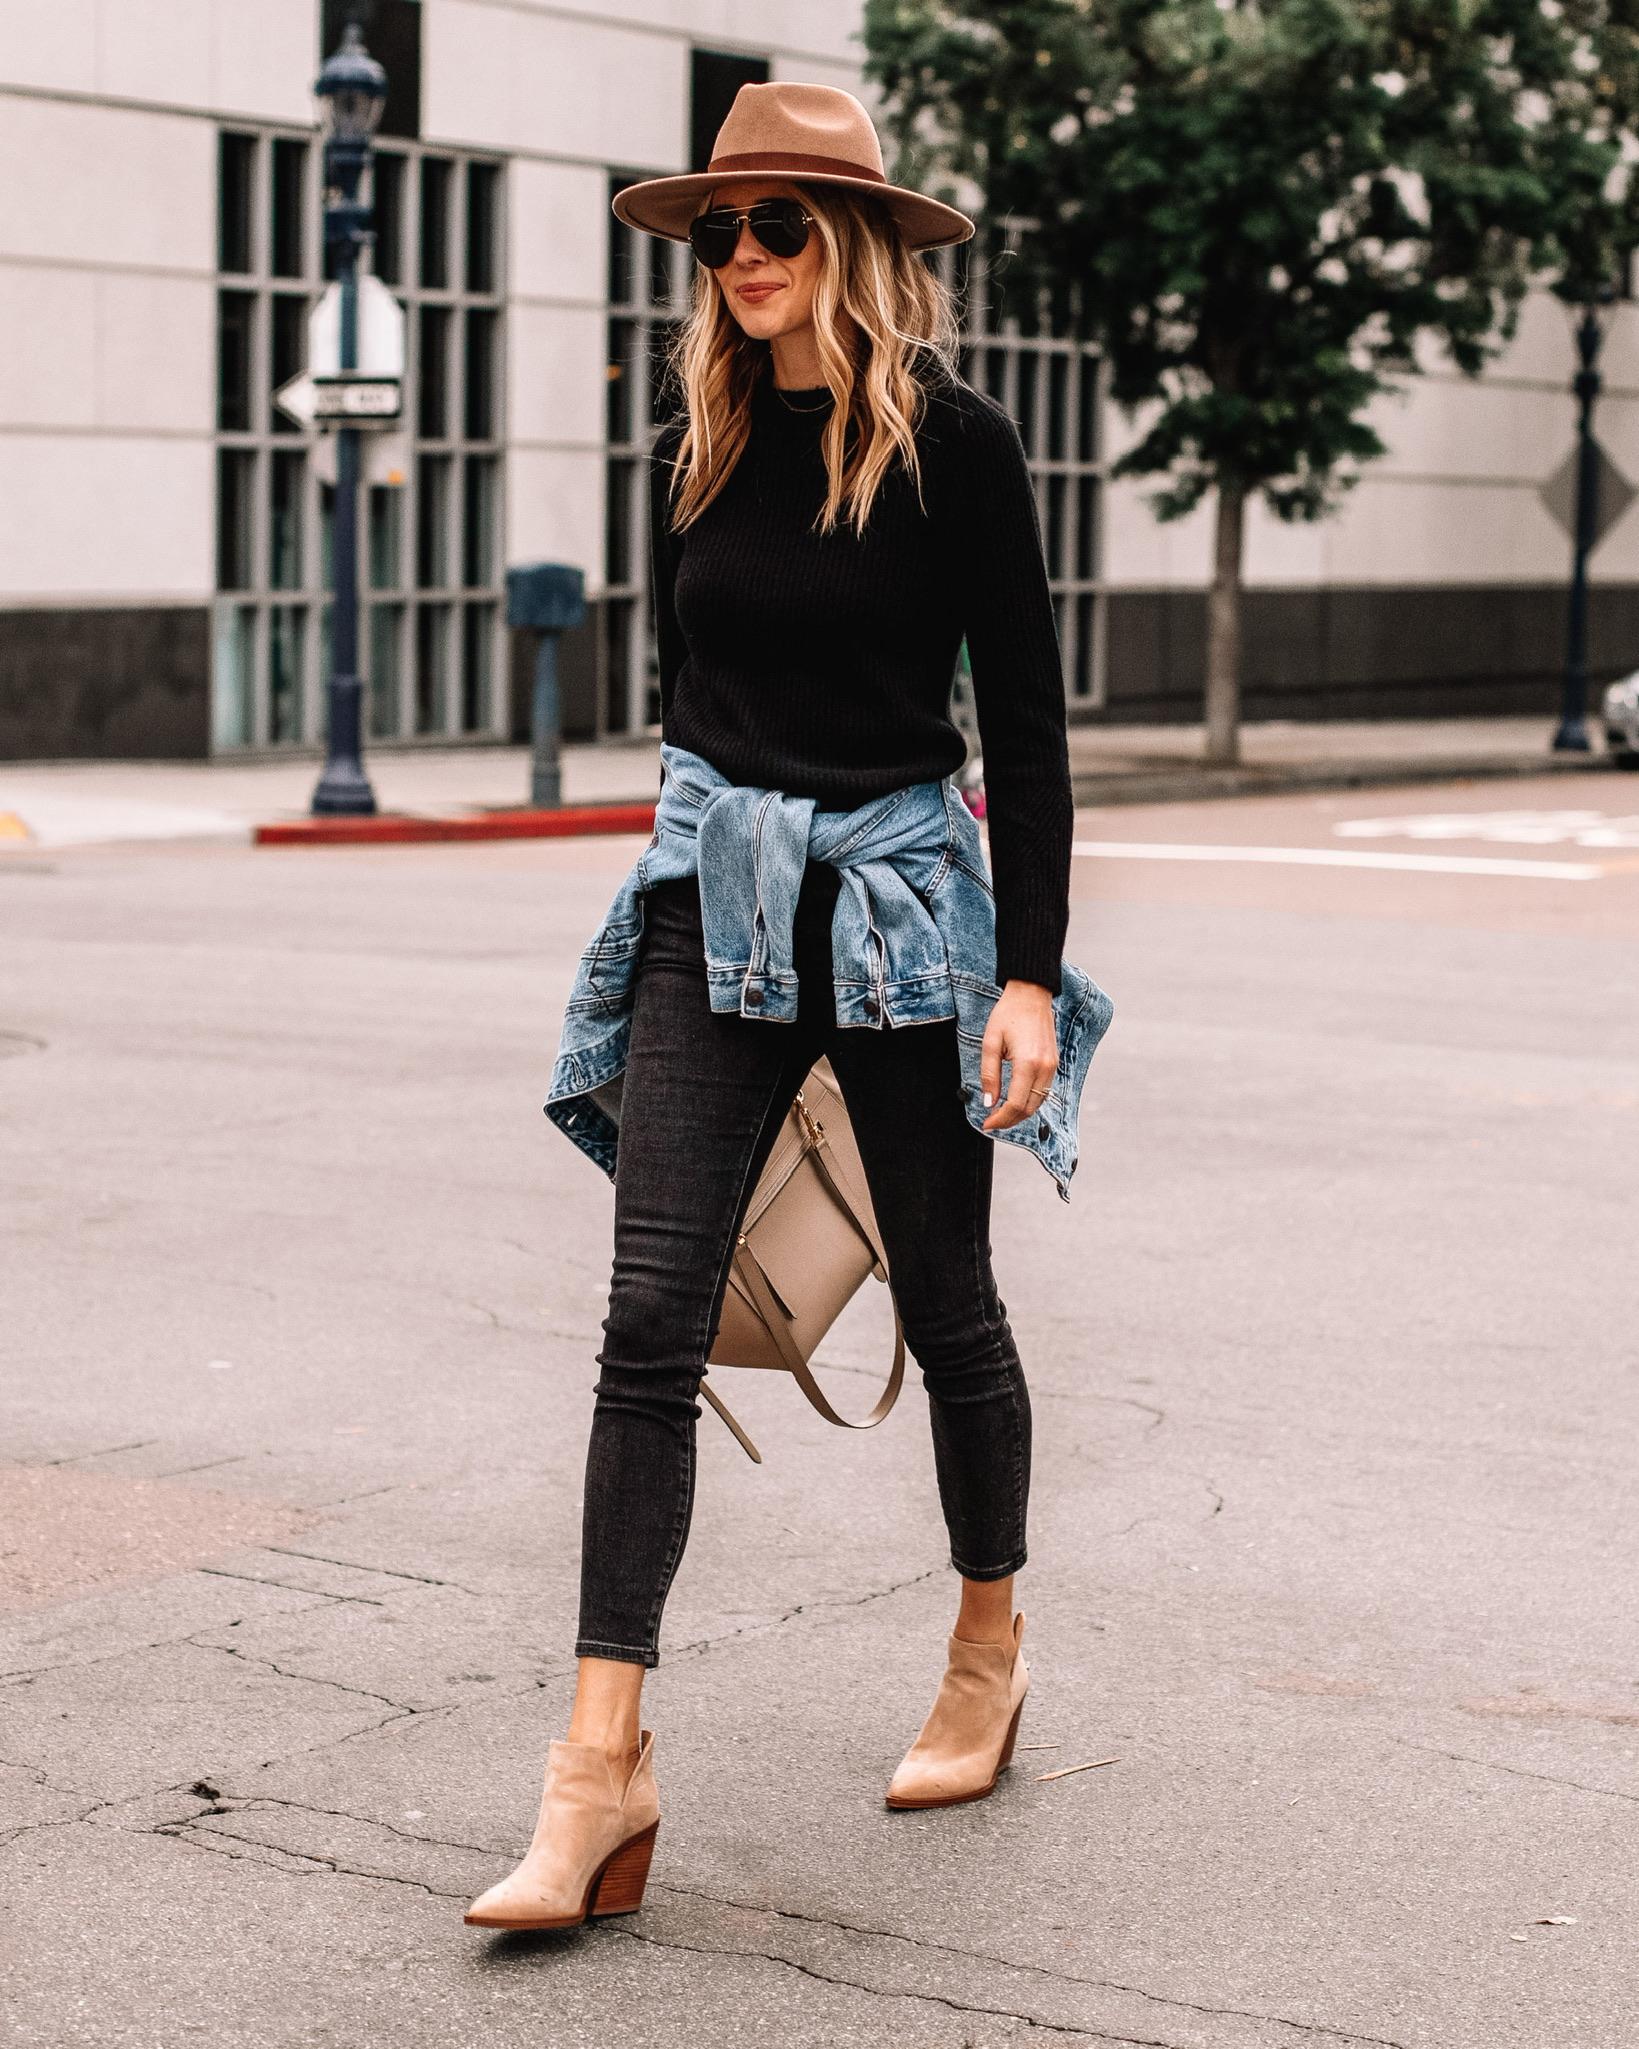 Fashion Jackson Wearing Tan Hat Black Sweater Black Skinny Jeans Tan Suede Booties Denim Jacket